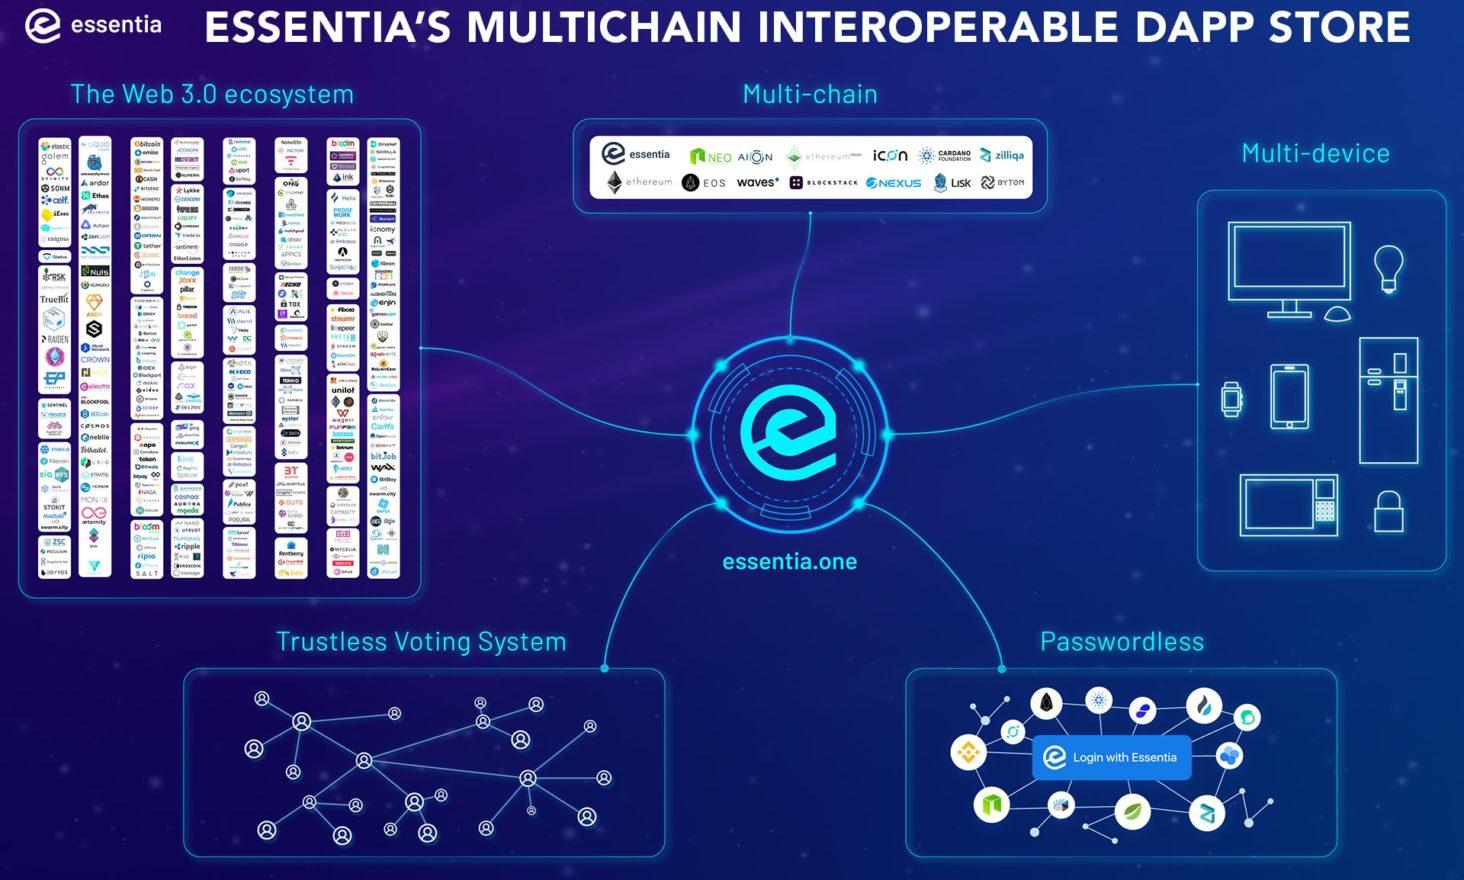 Essentia.One to Release World's First Interoperable Multi-Chain Dapp